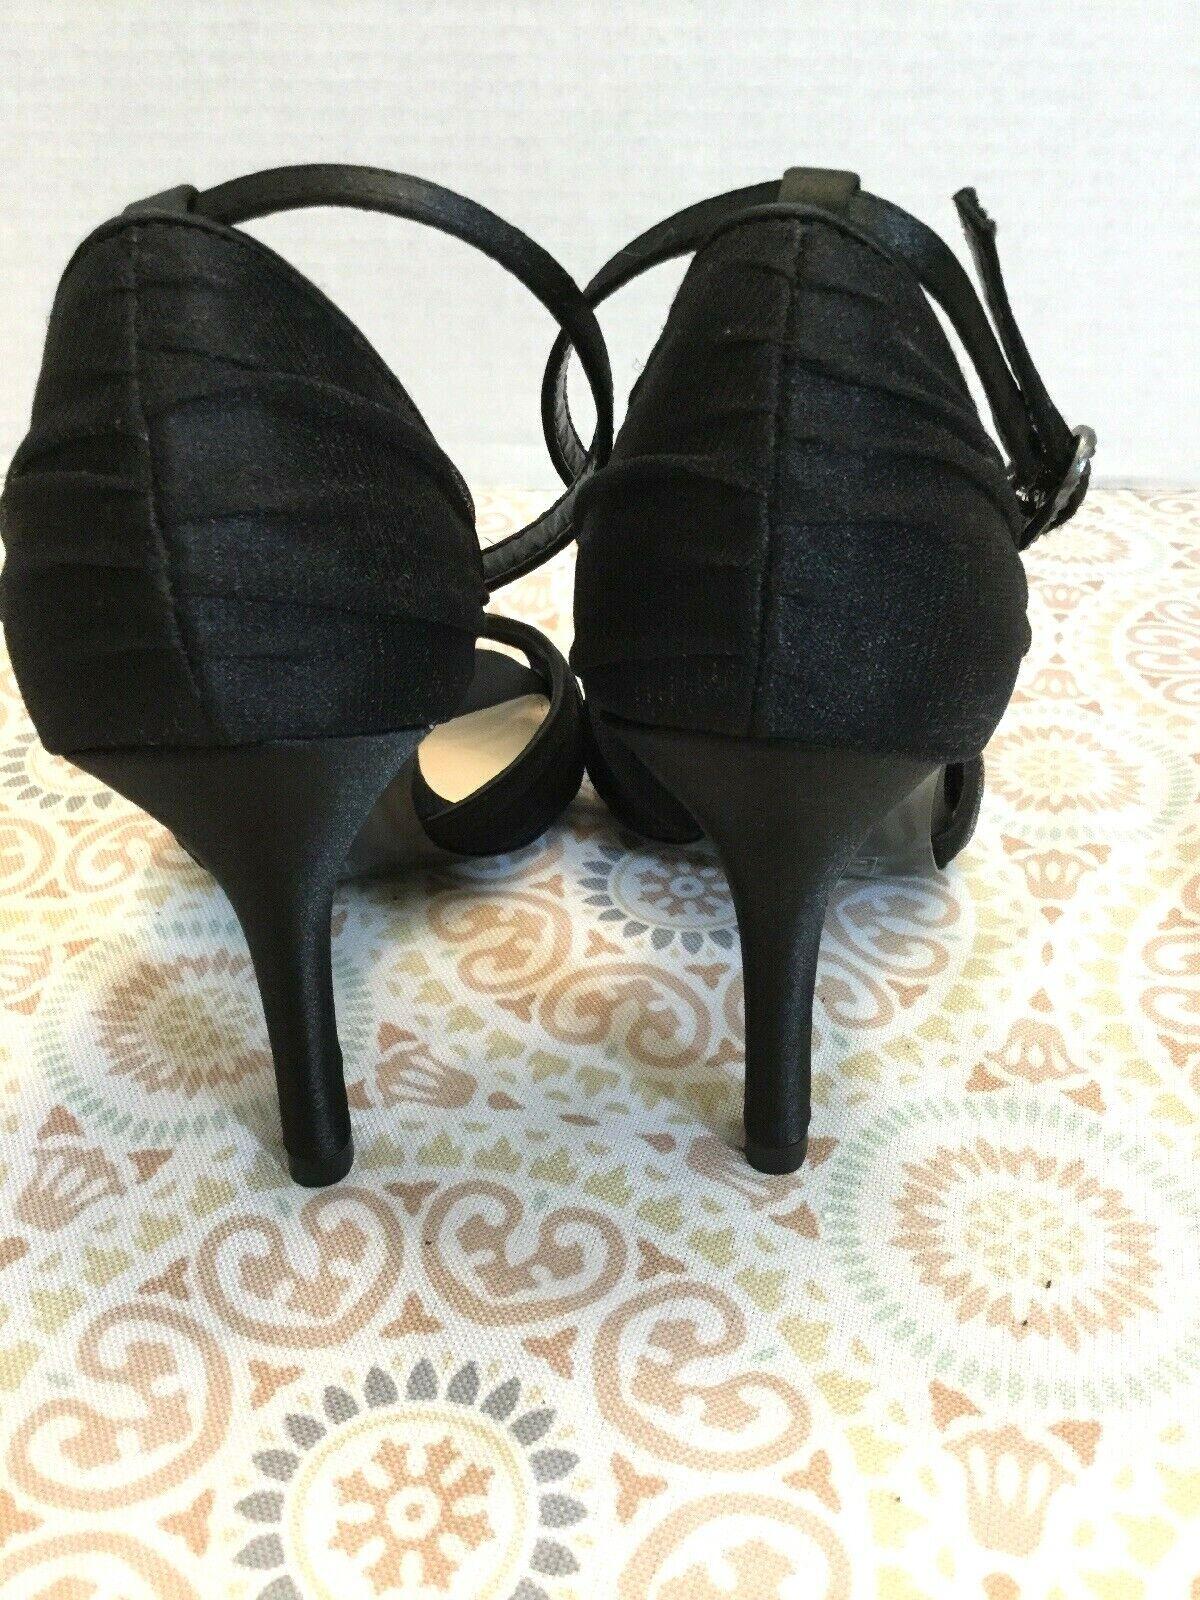 NEW DSW DSW DSW Disney Glass Slipper Collection Black Bow Heel Leather Sole Sz. 7 9aa41e